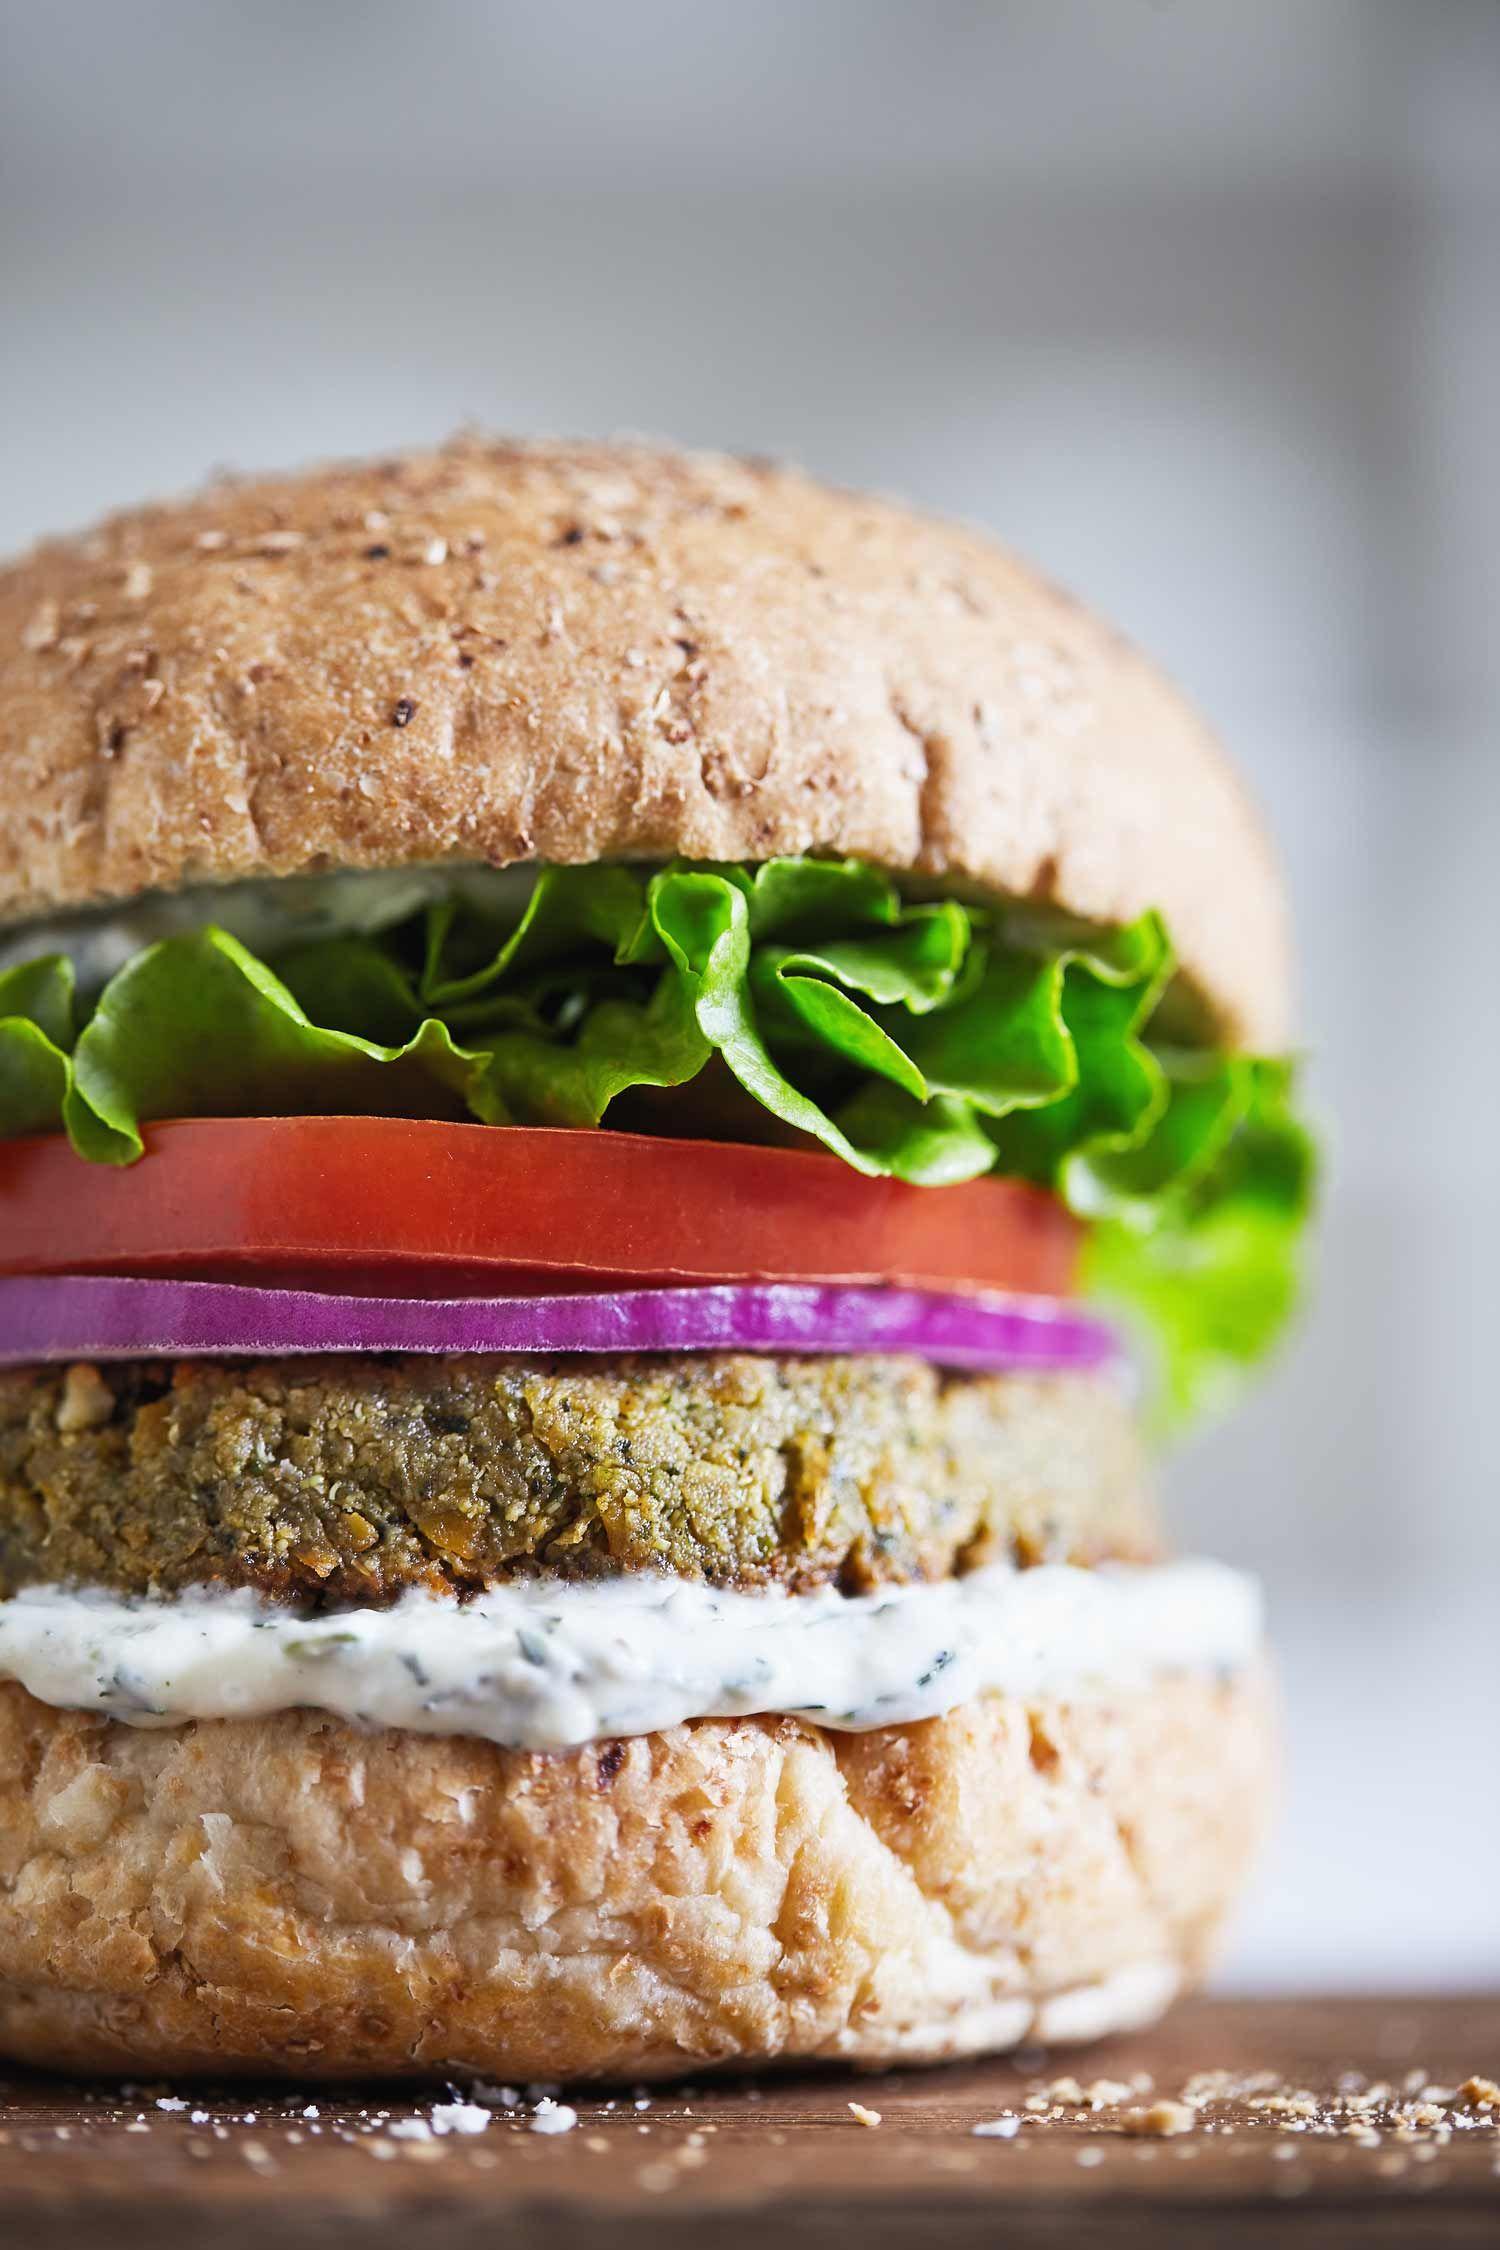 Because vegetarians deserve epic burgers too. (GF)